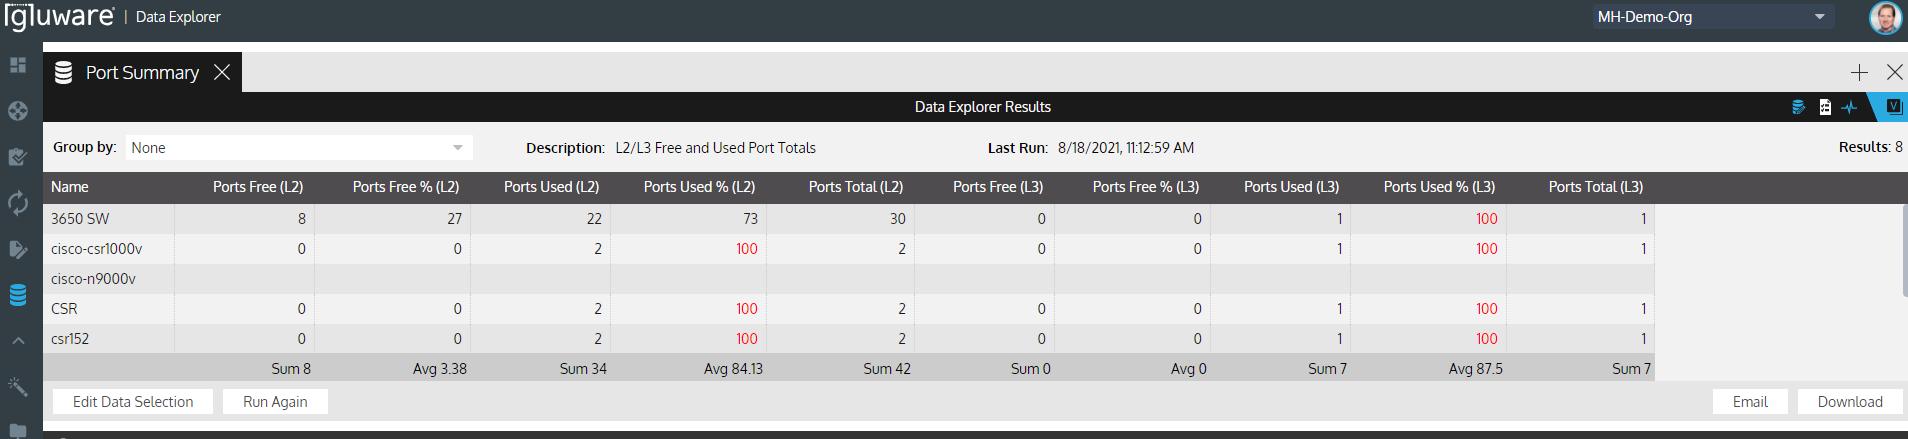 Data Explorer - Data Explorer Port Summary report 4.1